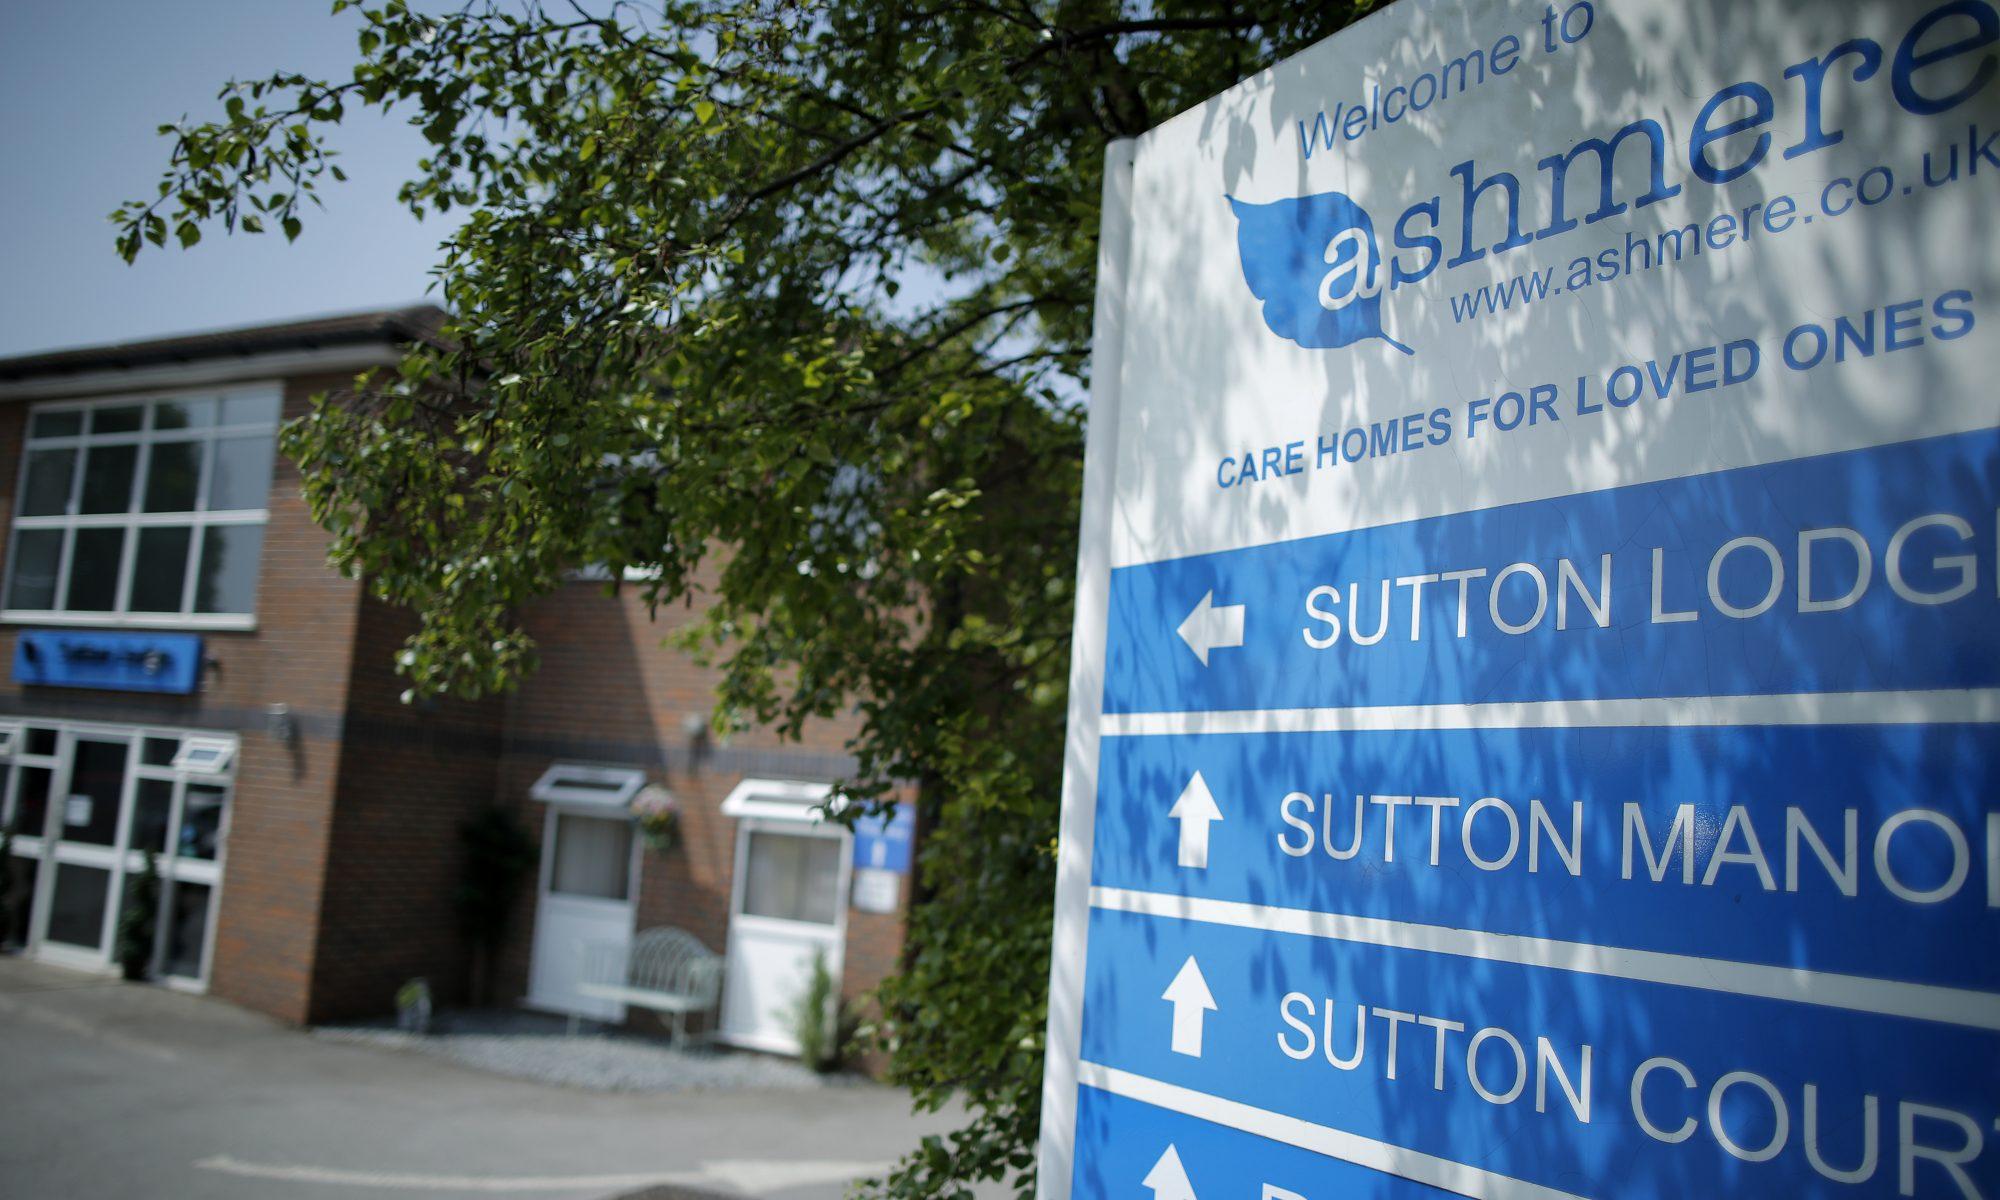 Ashmere Care Homes